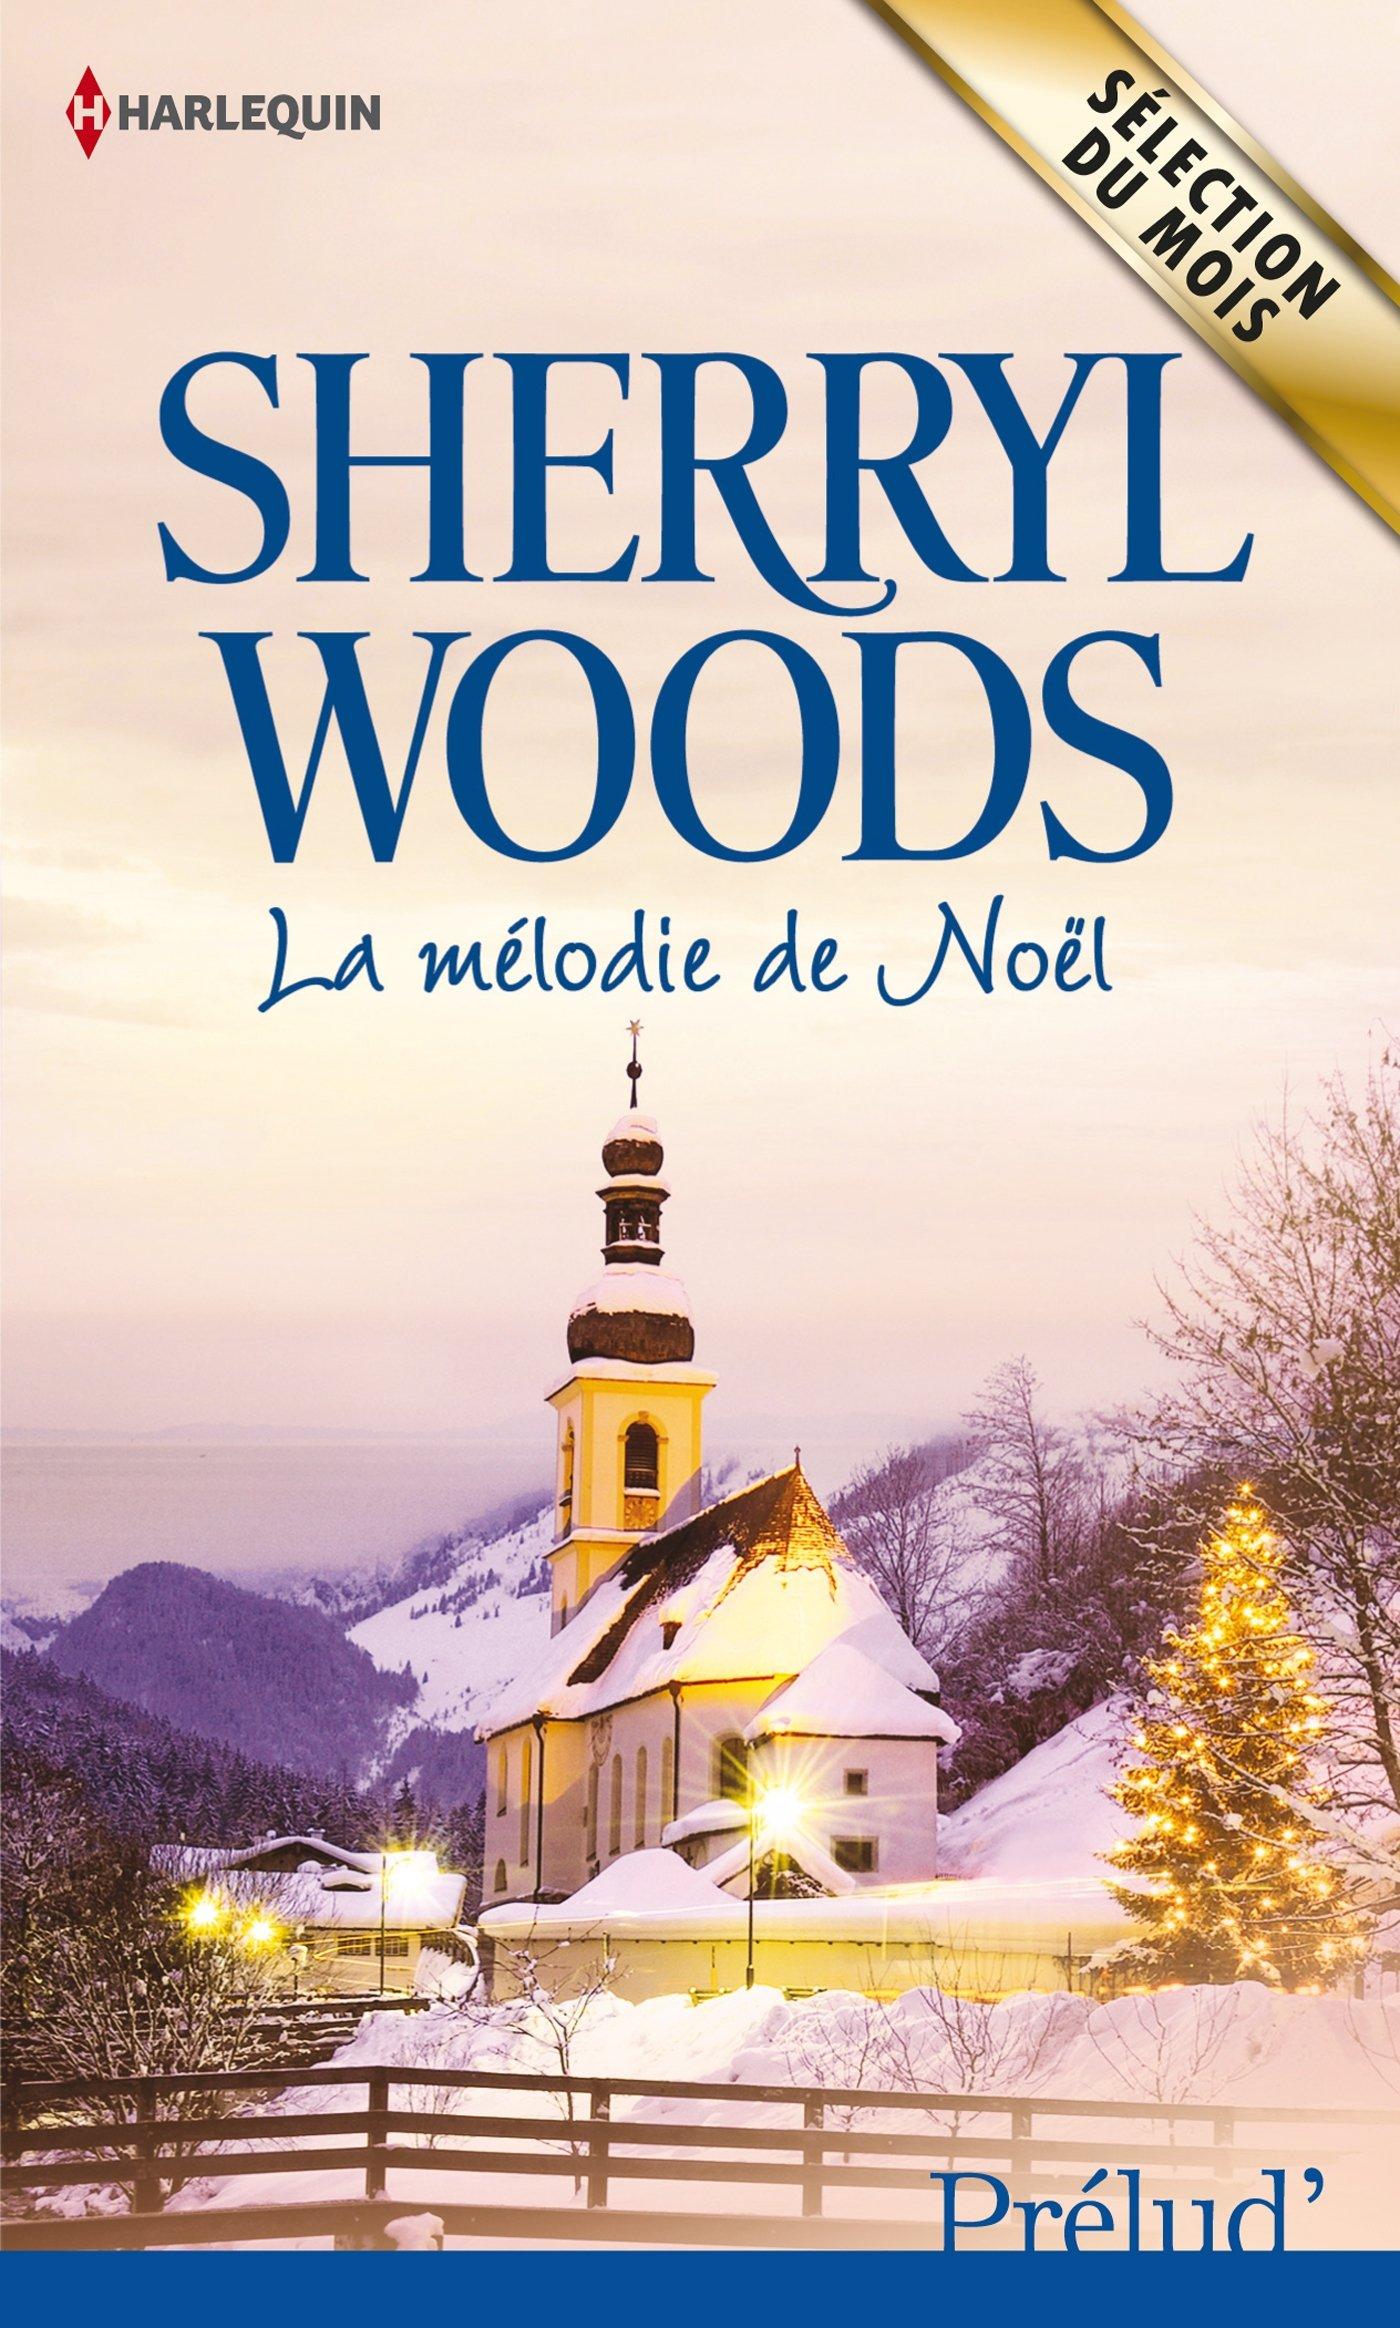 La Melodie De Noel La mélodie de Noël (Prelud' (409)): 9782280314466: Amazon.com: Books